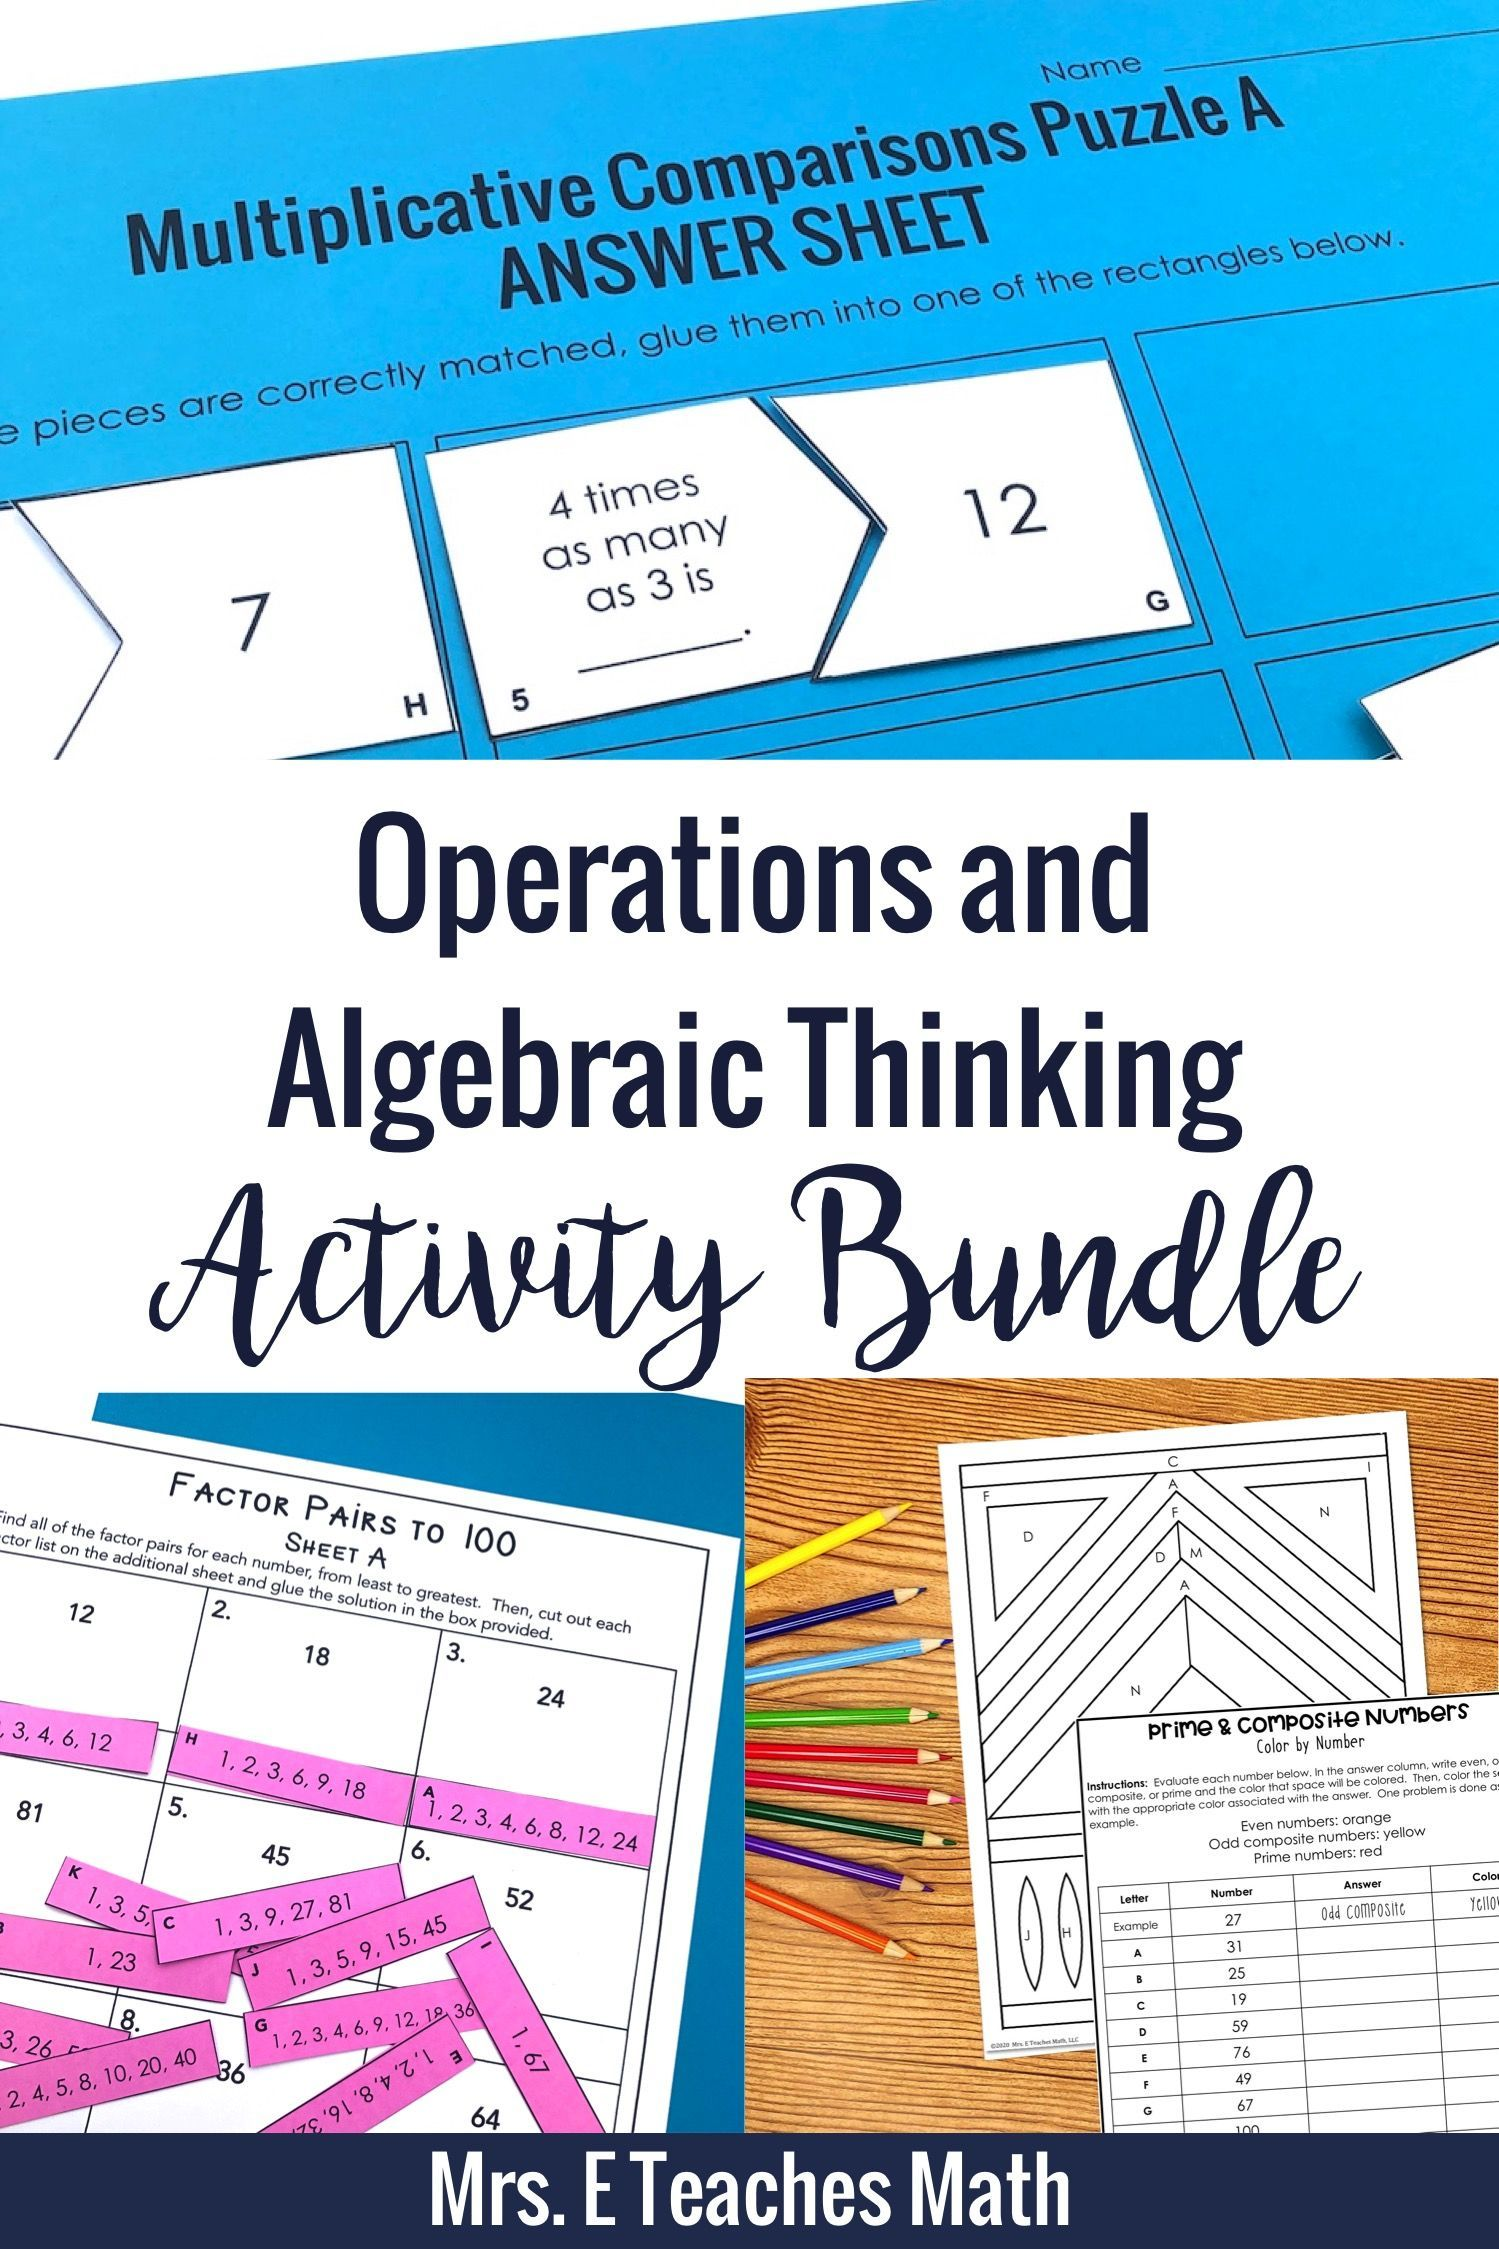 hight resolution of Operations and Algebraic Thinking Activity Bundle 4.OA   Algebraic thinking